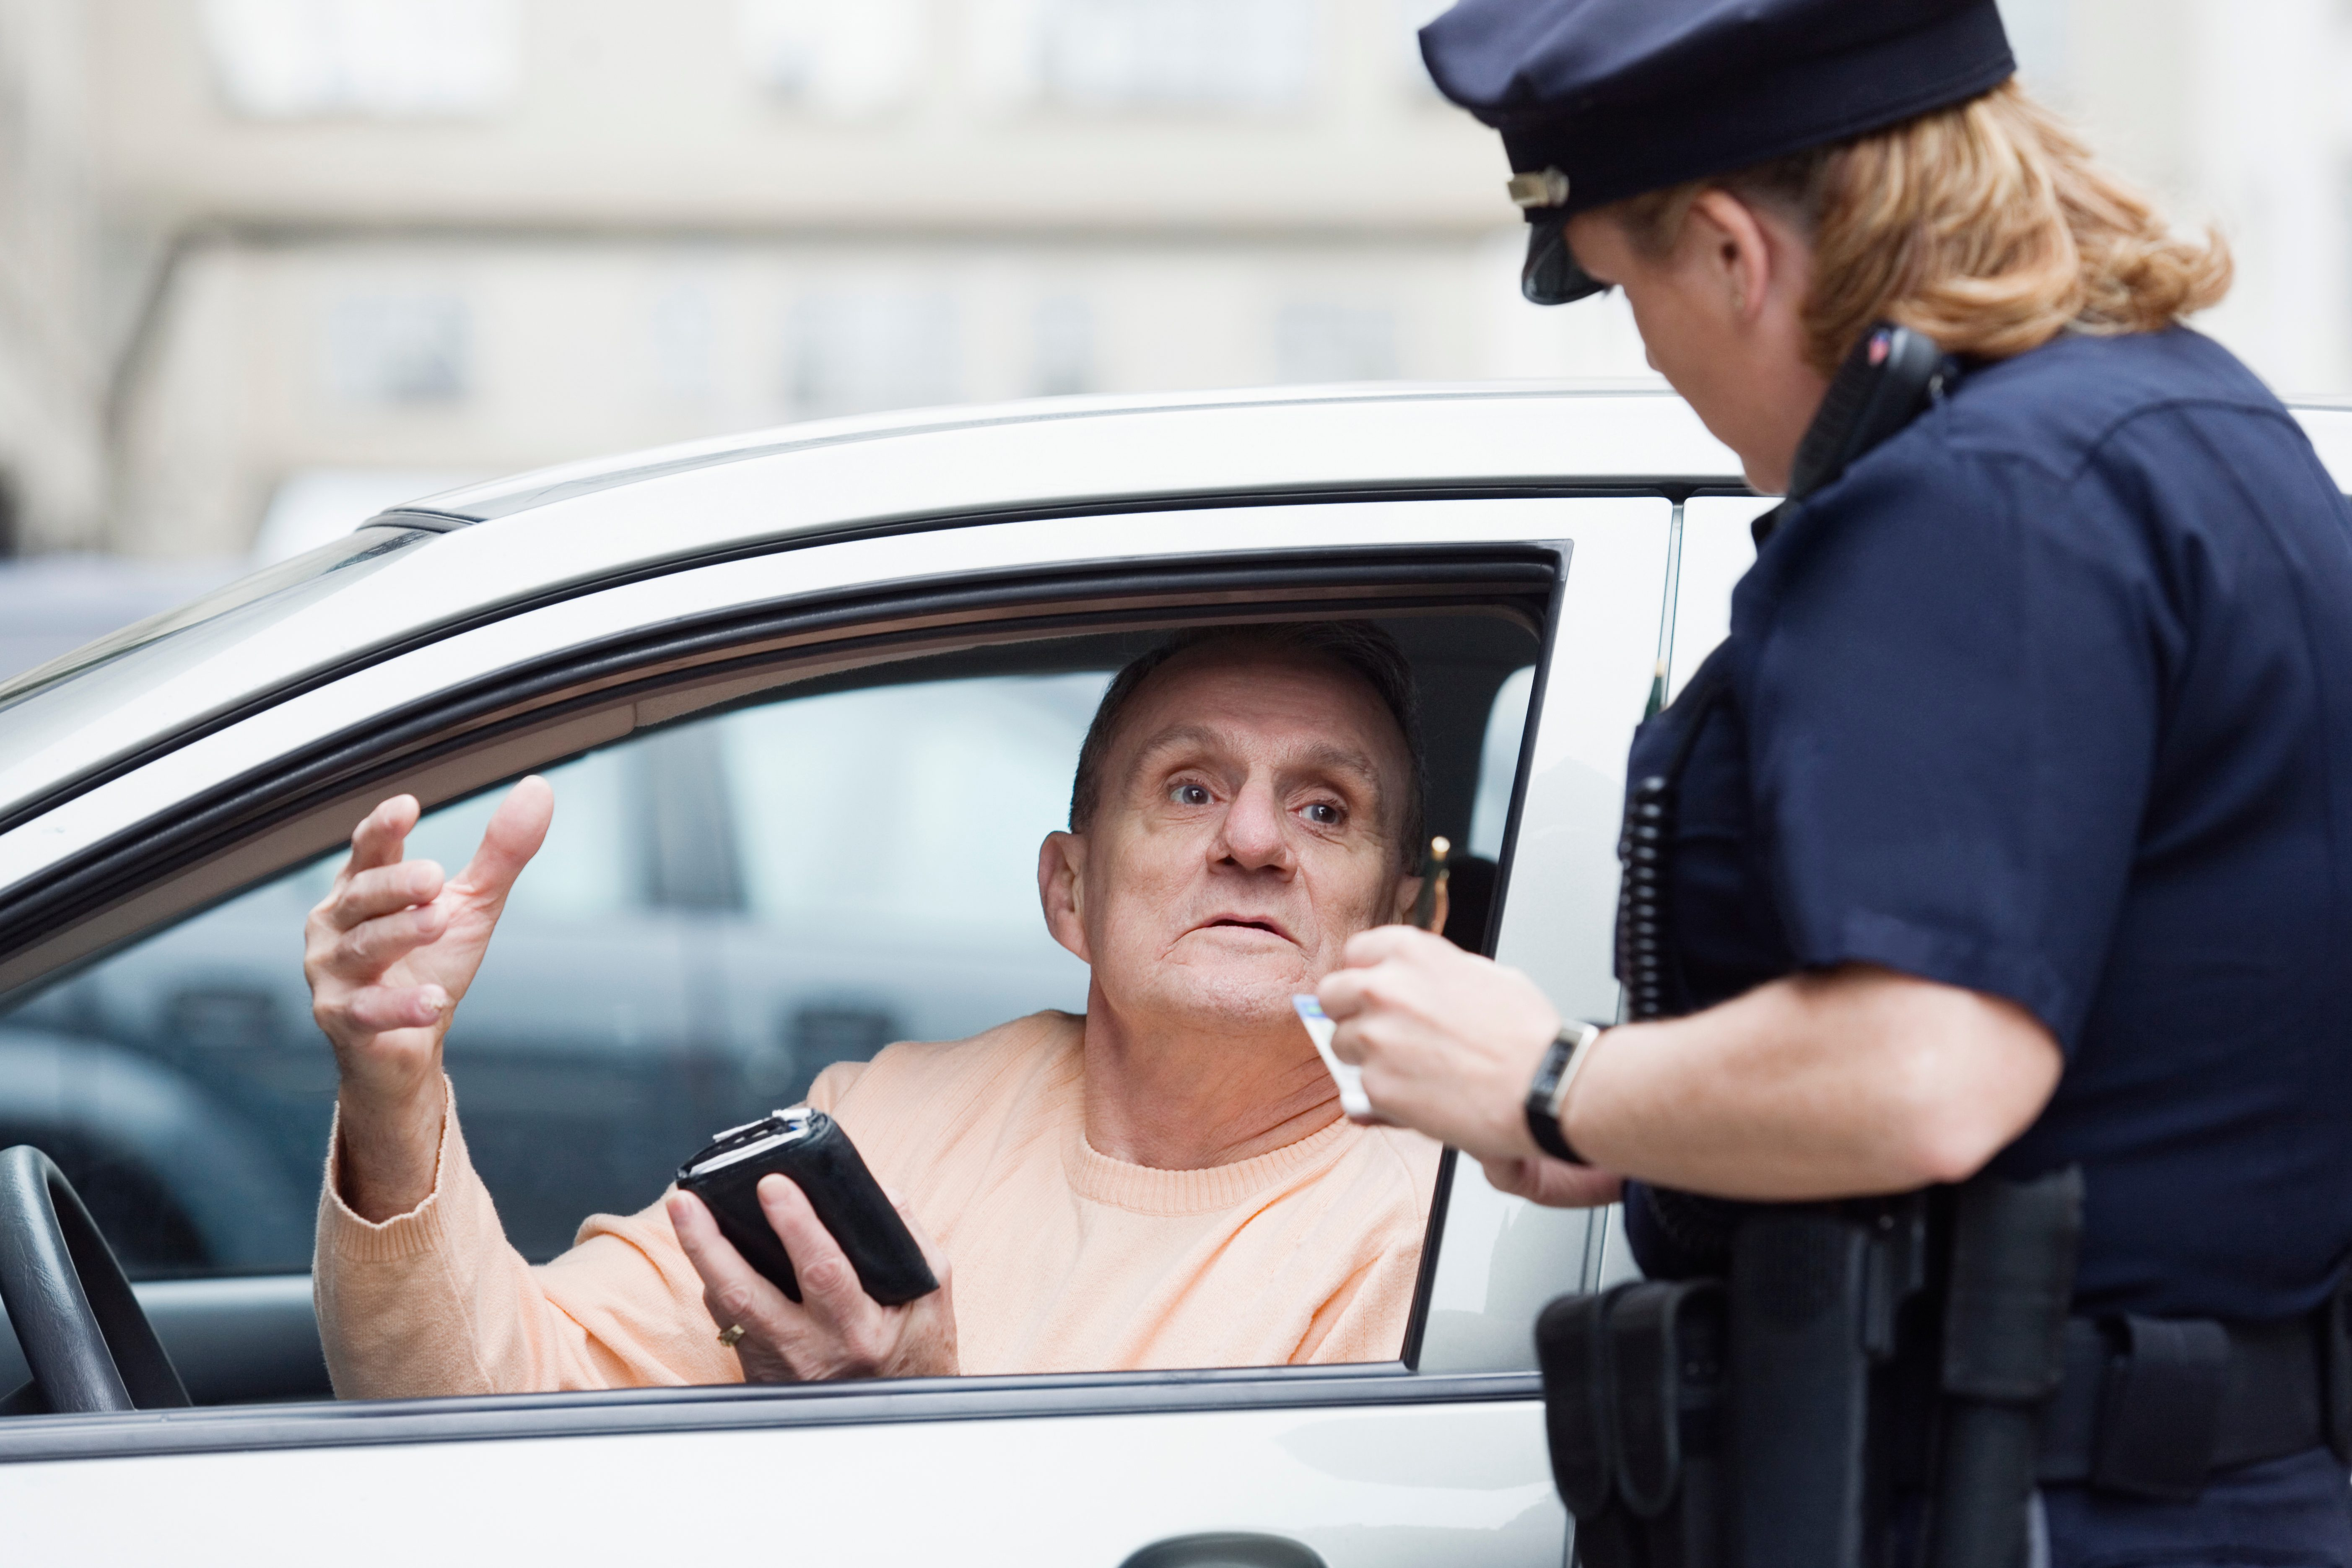 Policewoman interrogating a man